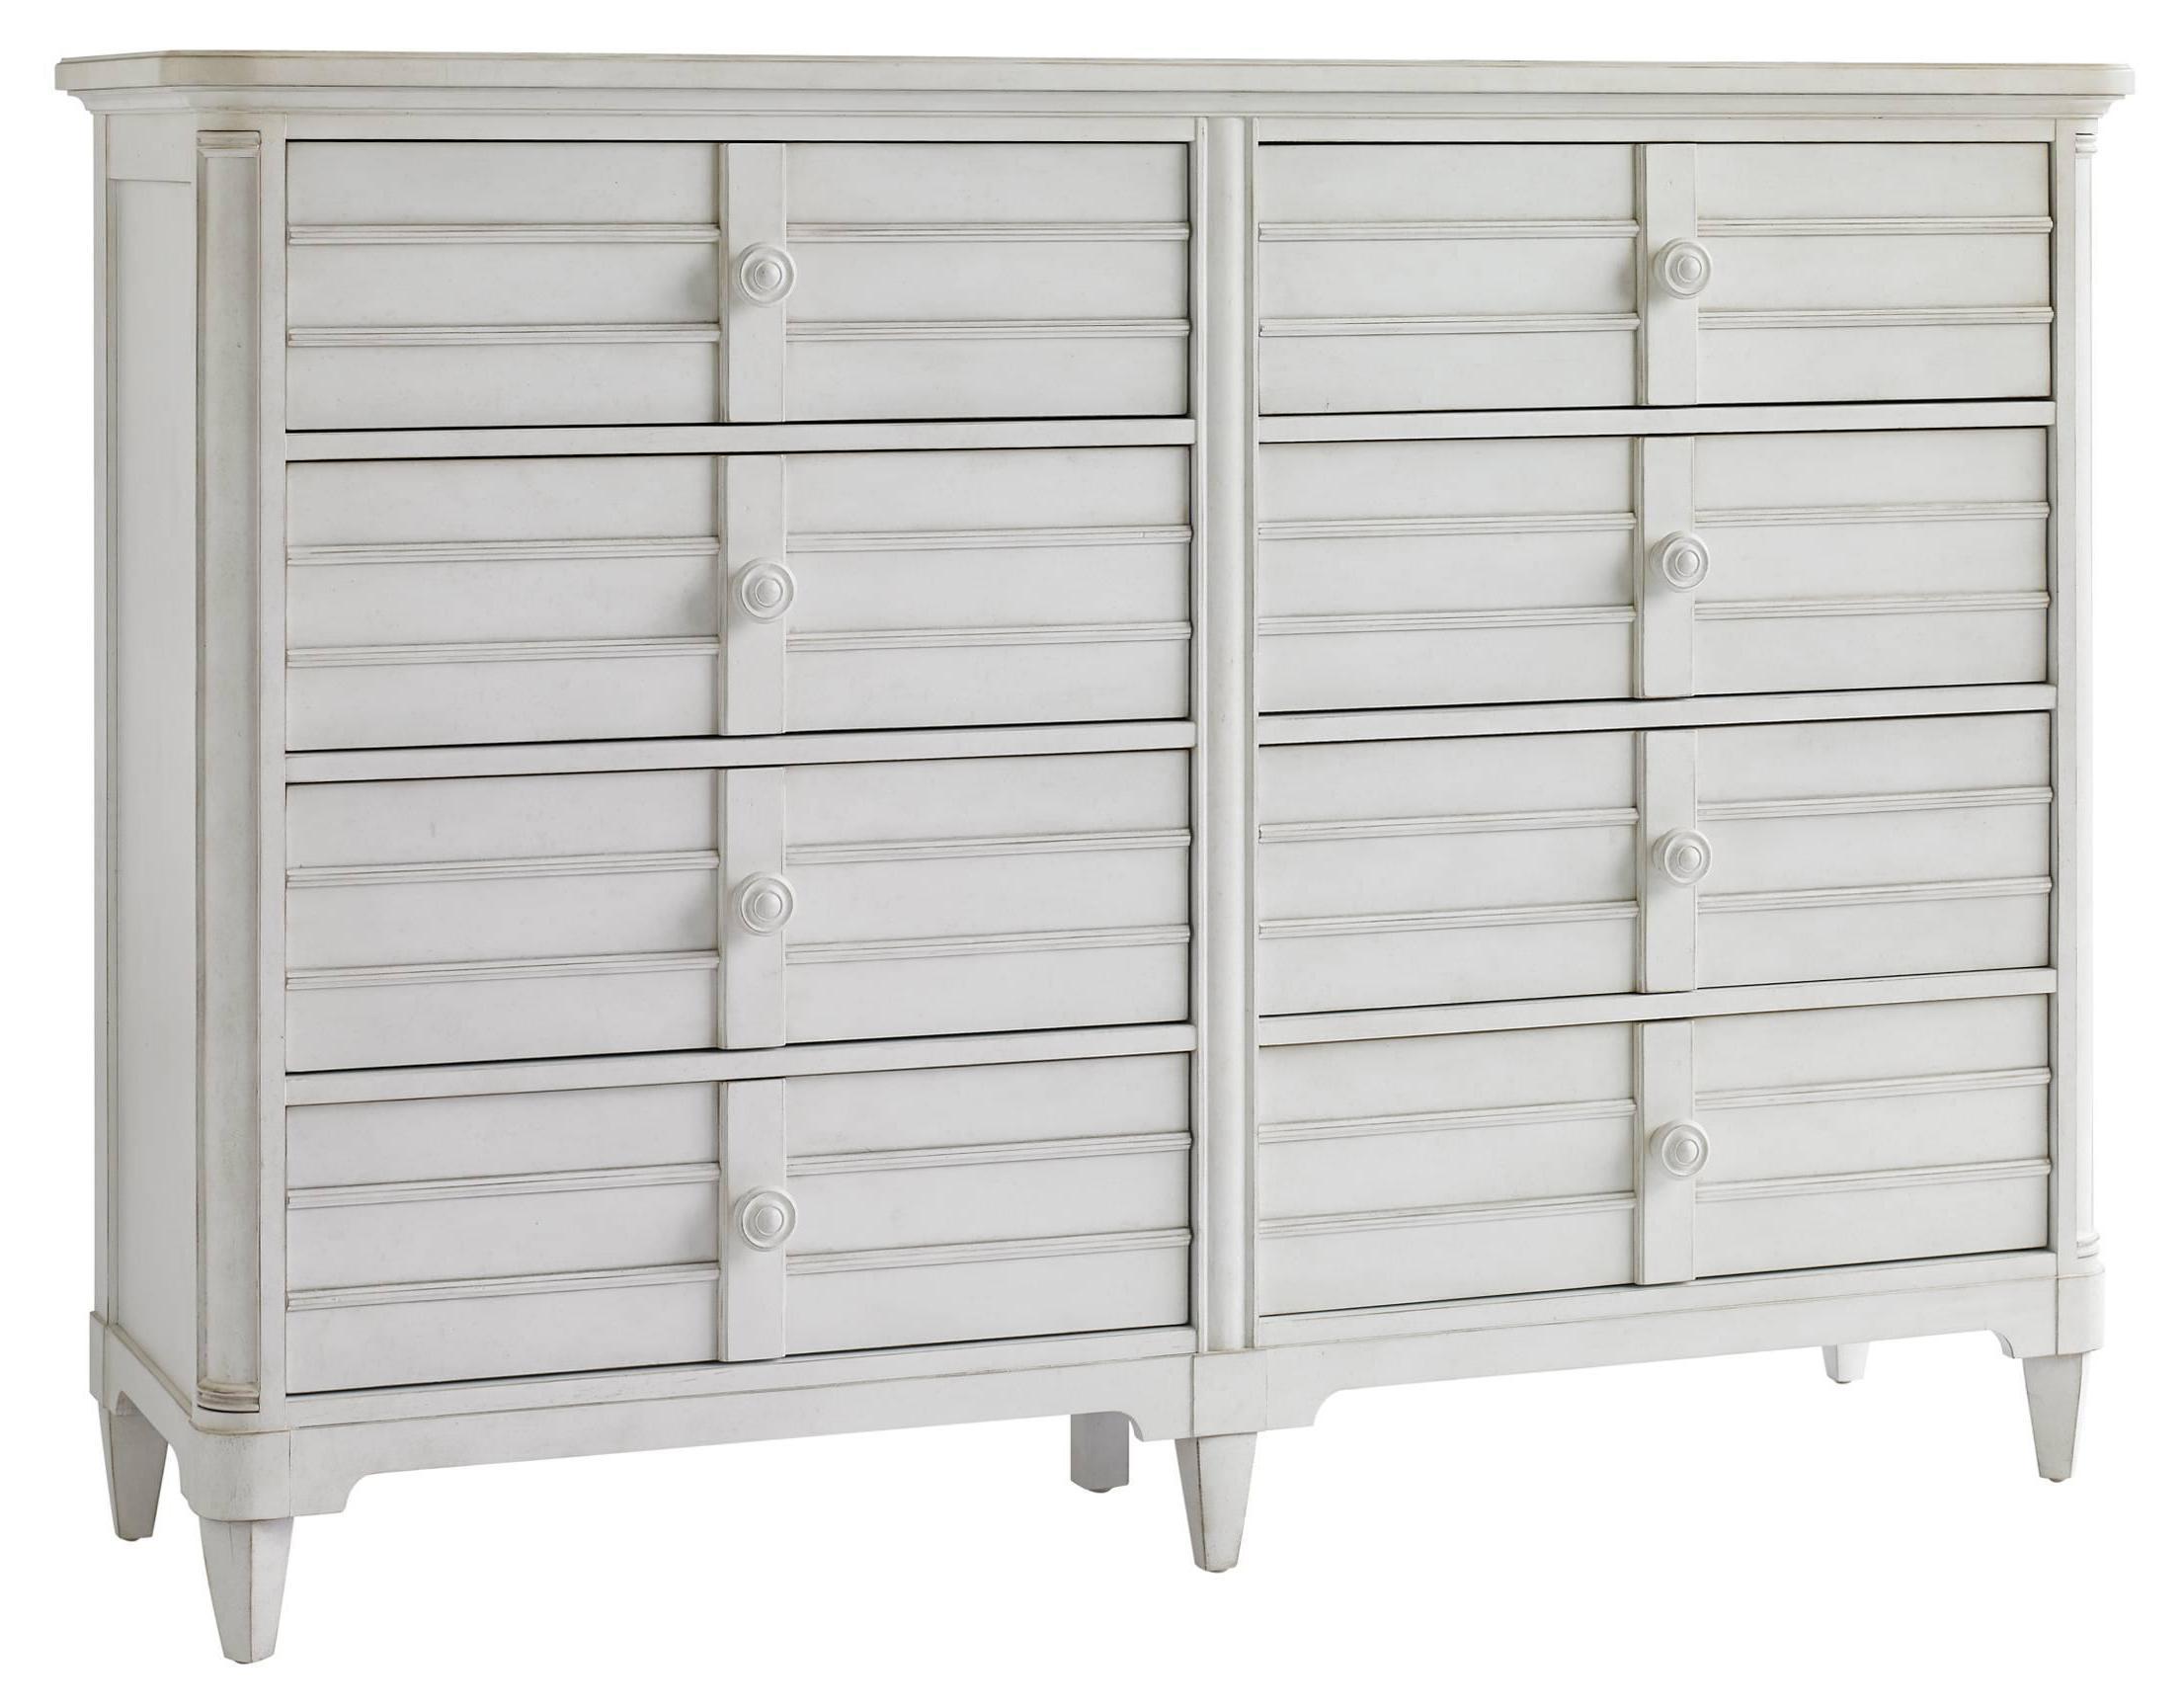 Stanley Furniture Cypress Grove   8 Drawer Dresser - Item Number: 451-23-06